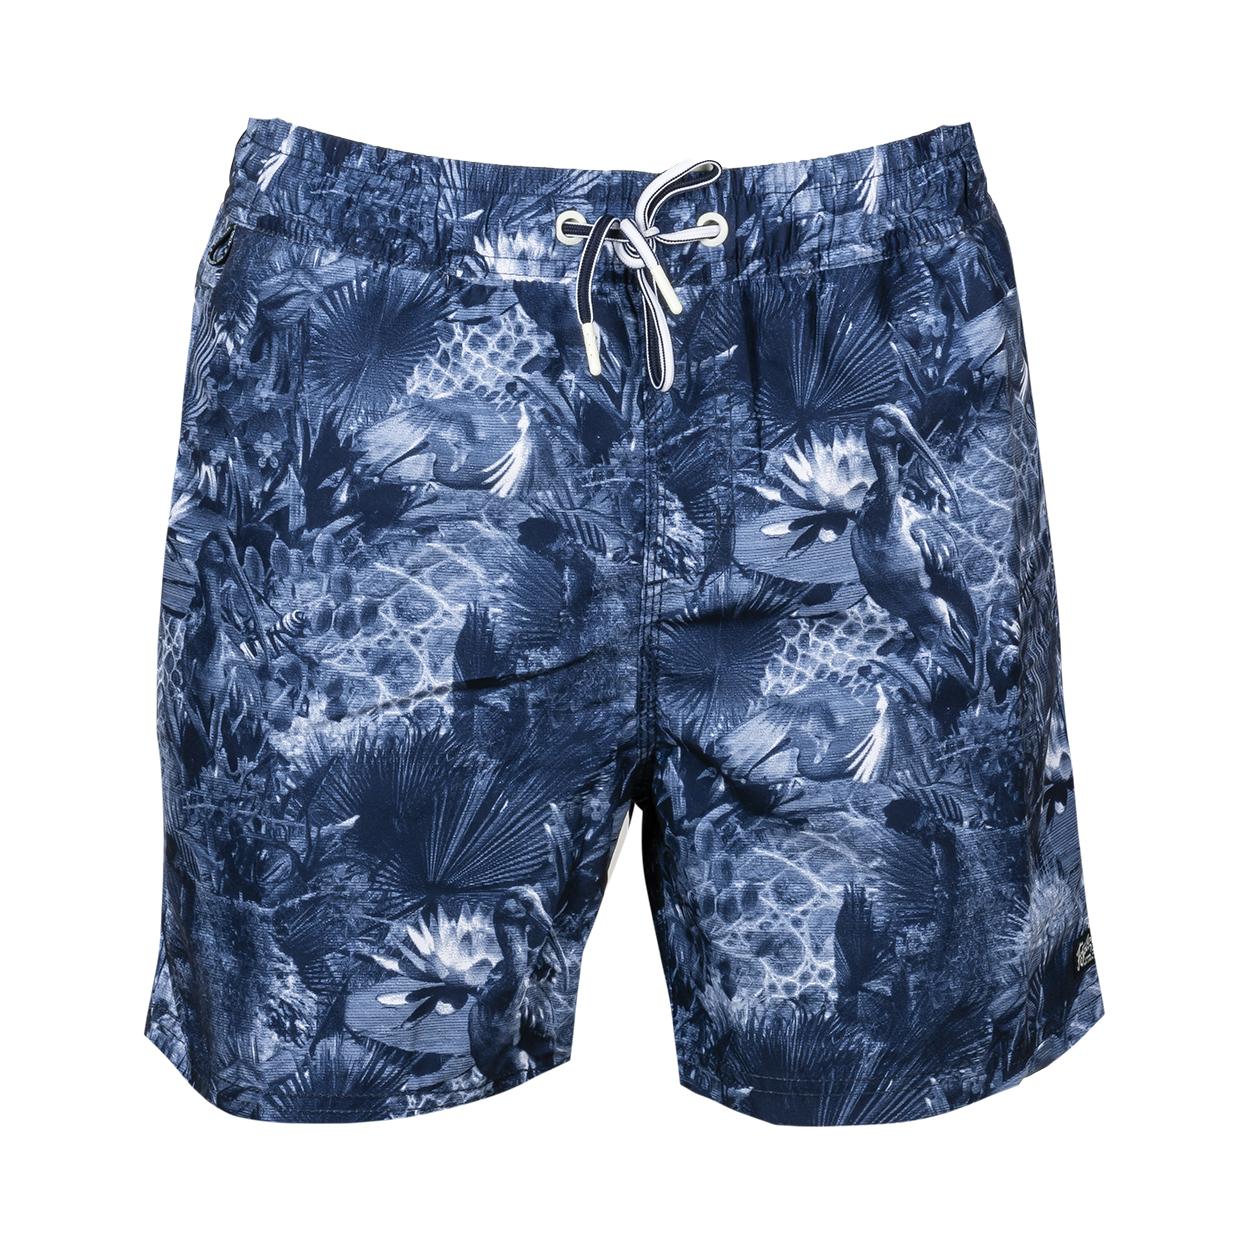 Short de bain Petrol Industries bleu marine à motifs blancs et bleu ciel